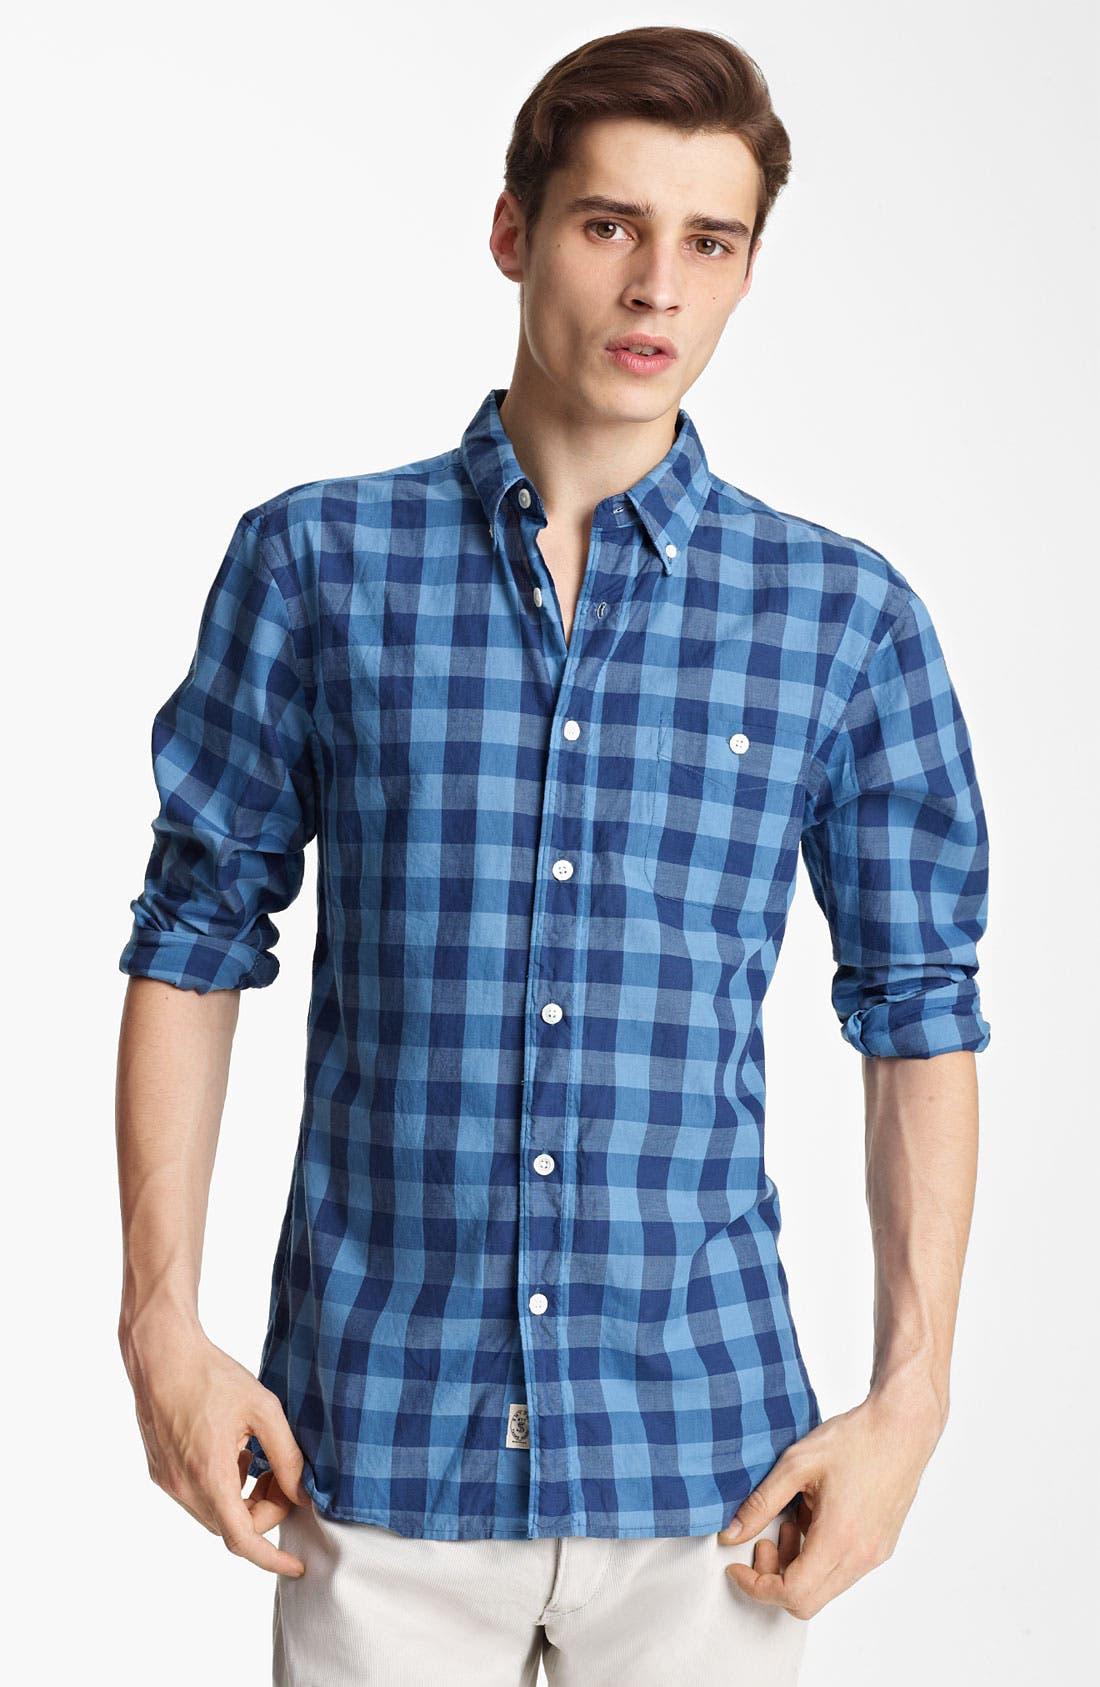 Main Image - Todd Snyder Check Woven Shirt